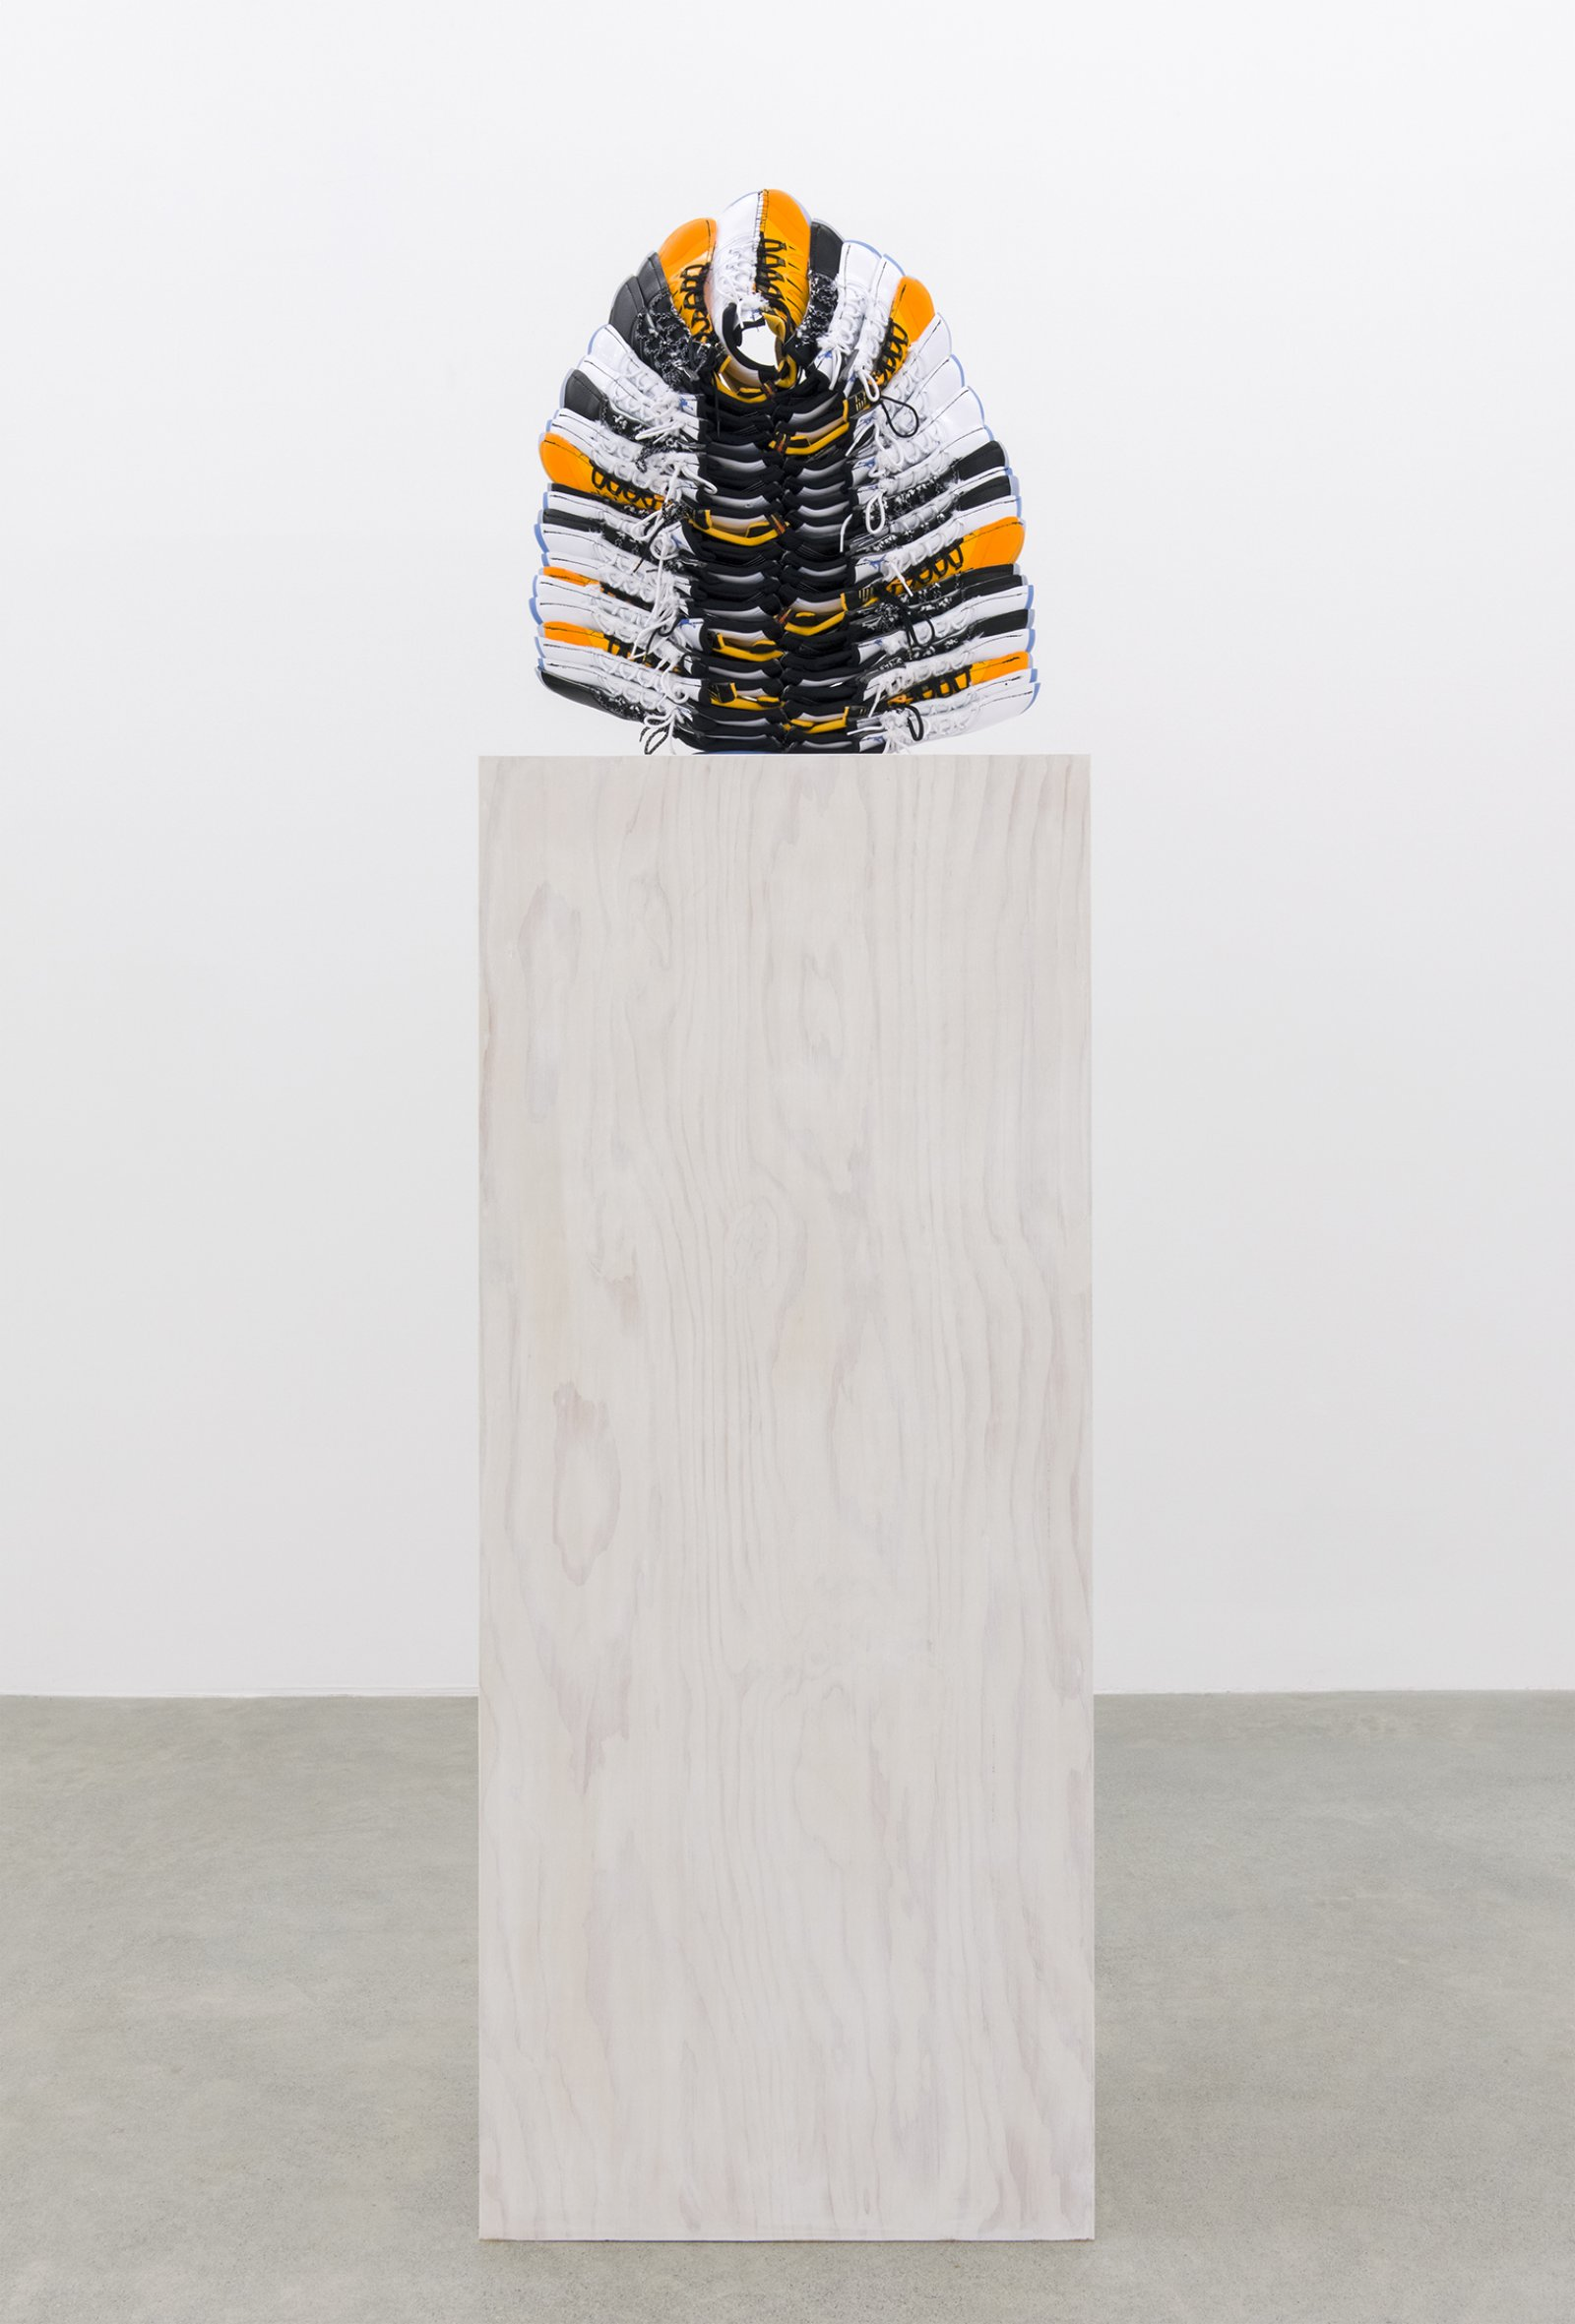 Brian Jungen, Lay Down Tender Fire, 2015–2016, nike air jordans, painted fir plywood, stainless steel, 100 x 17 x 24 in. (254 x 43 x 61 cm) by Brian Jungen